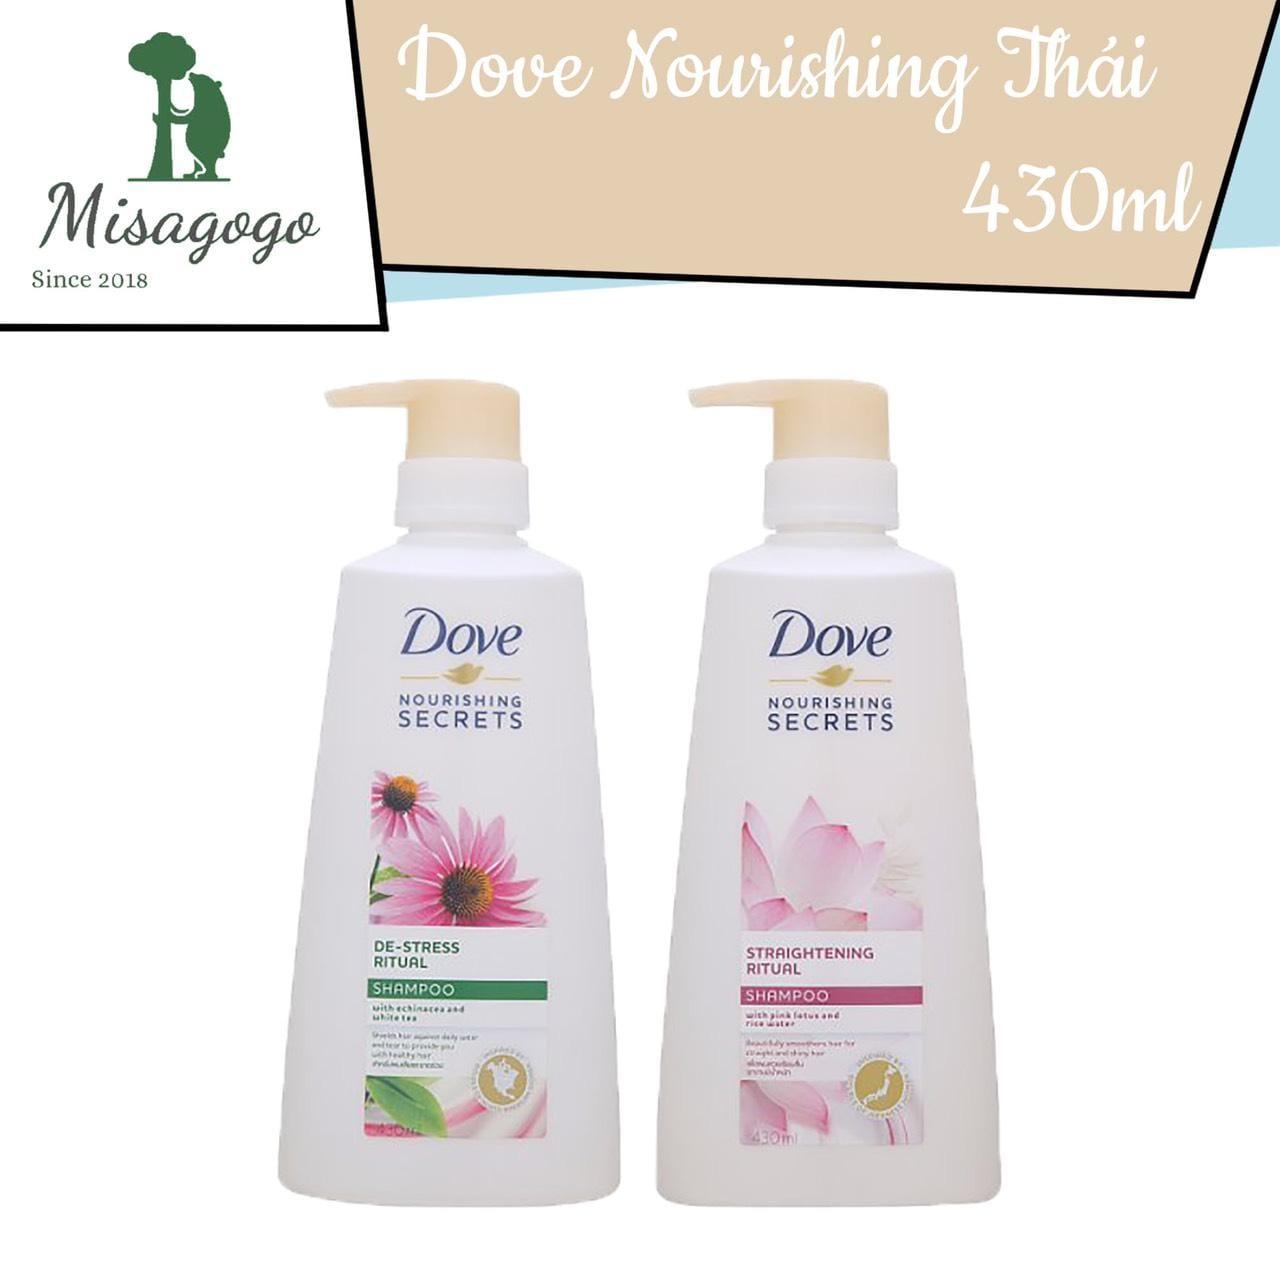 Dầu gội Dove nourishing secrets 430ml Thái Lan